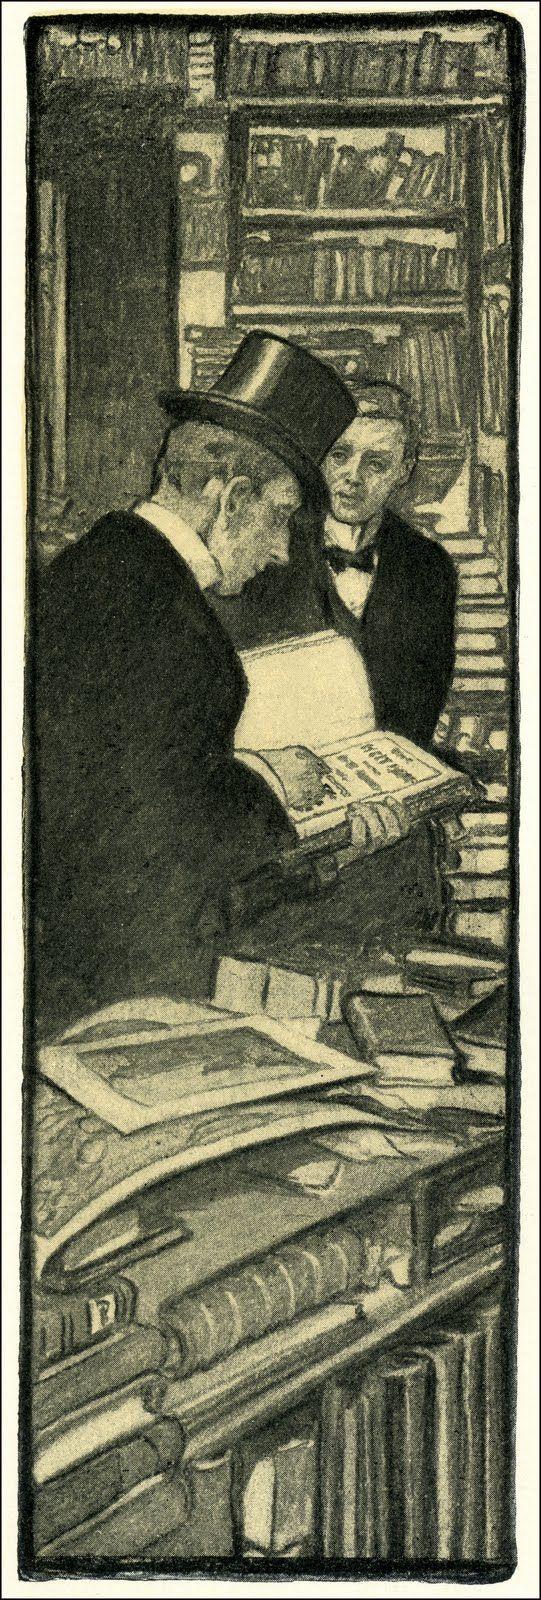 Elizabeth Shippen Green 1903 illustration from Harper's Monthly